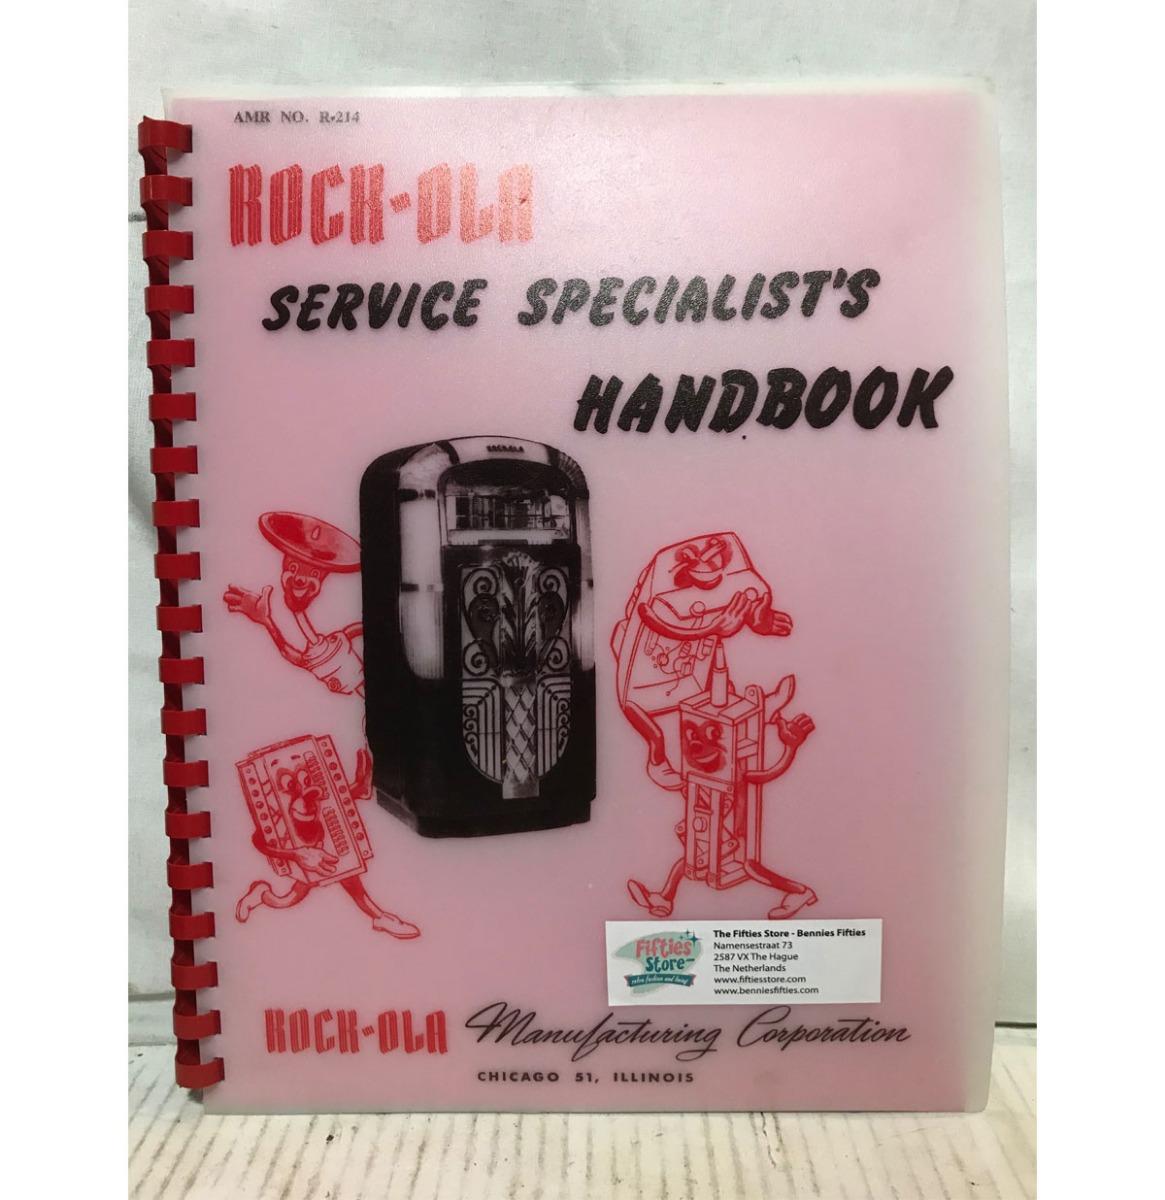 Rock-Ola 1422, 1426 and 1428 Jukebox Service Specialist Handbook